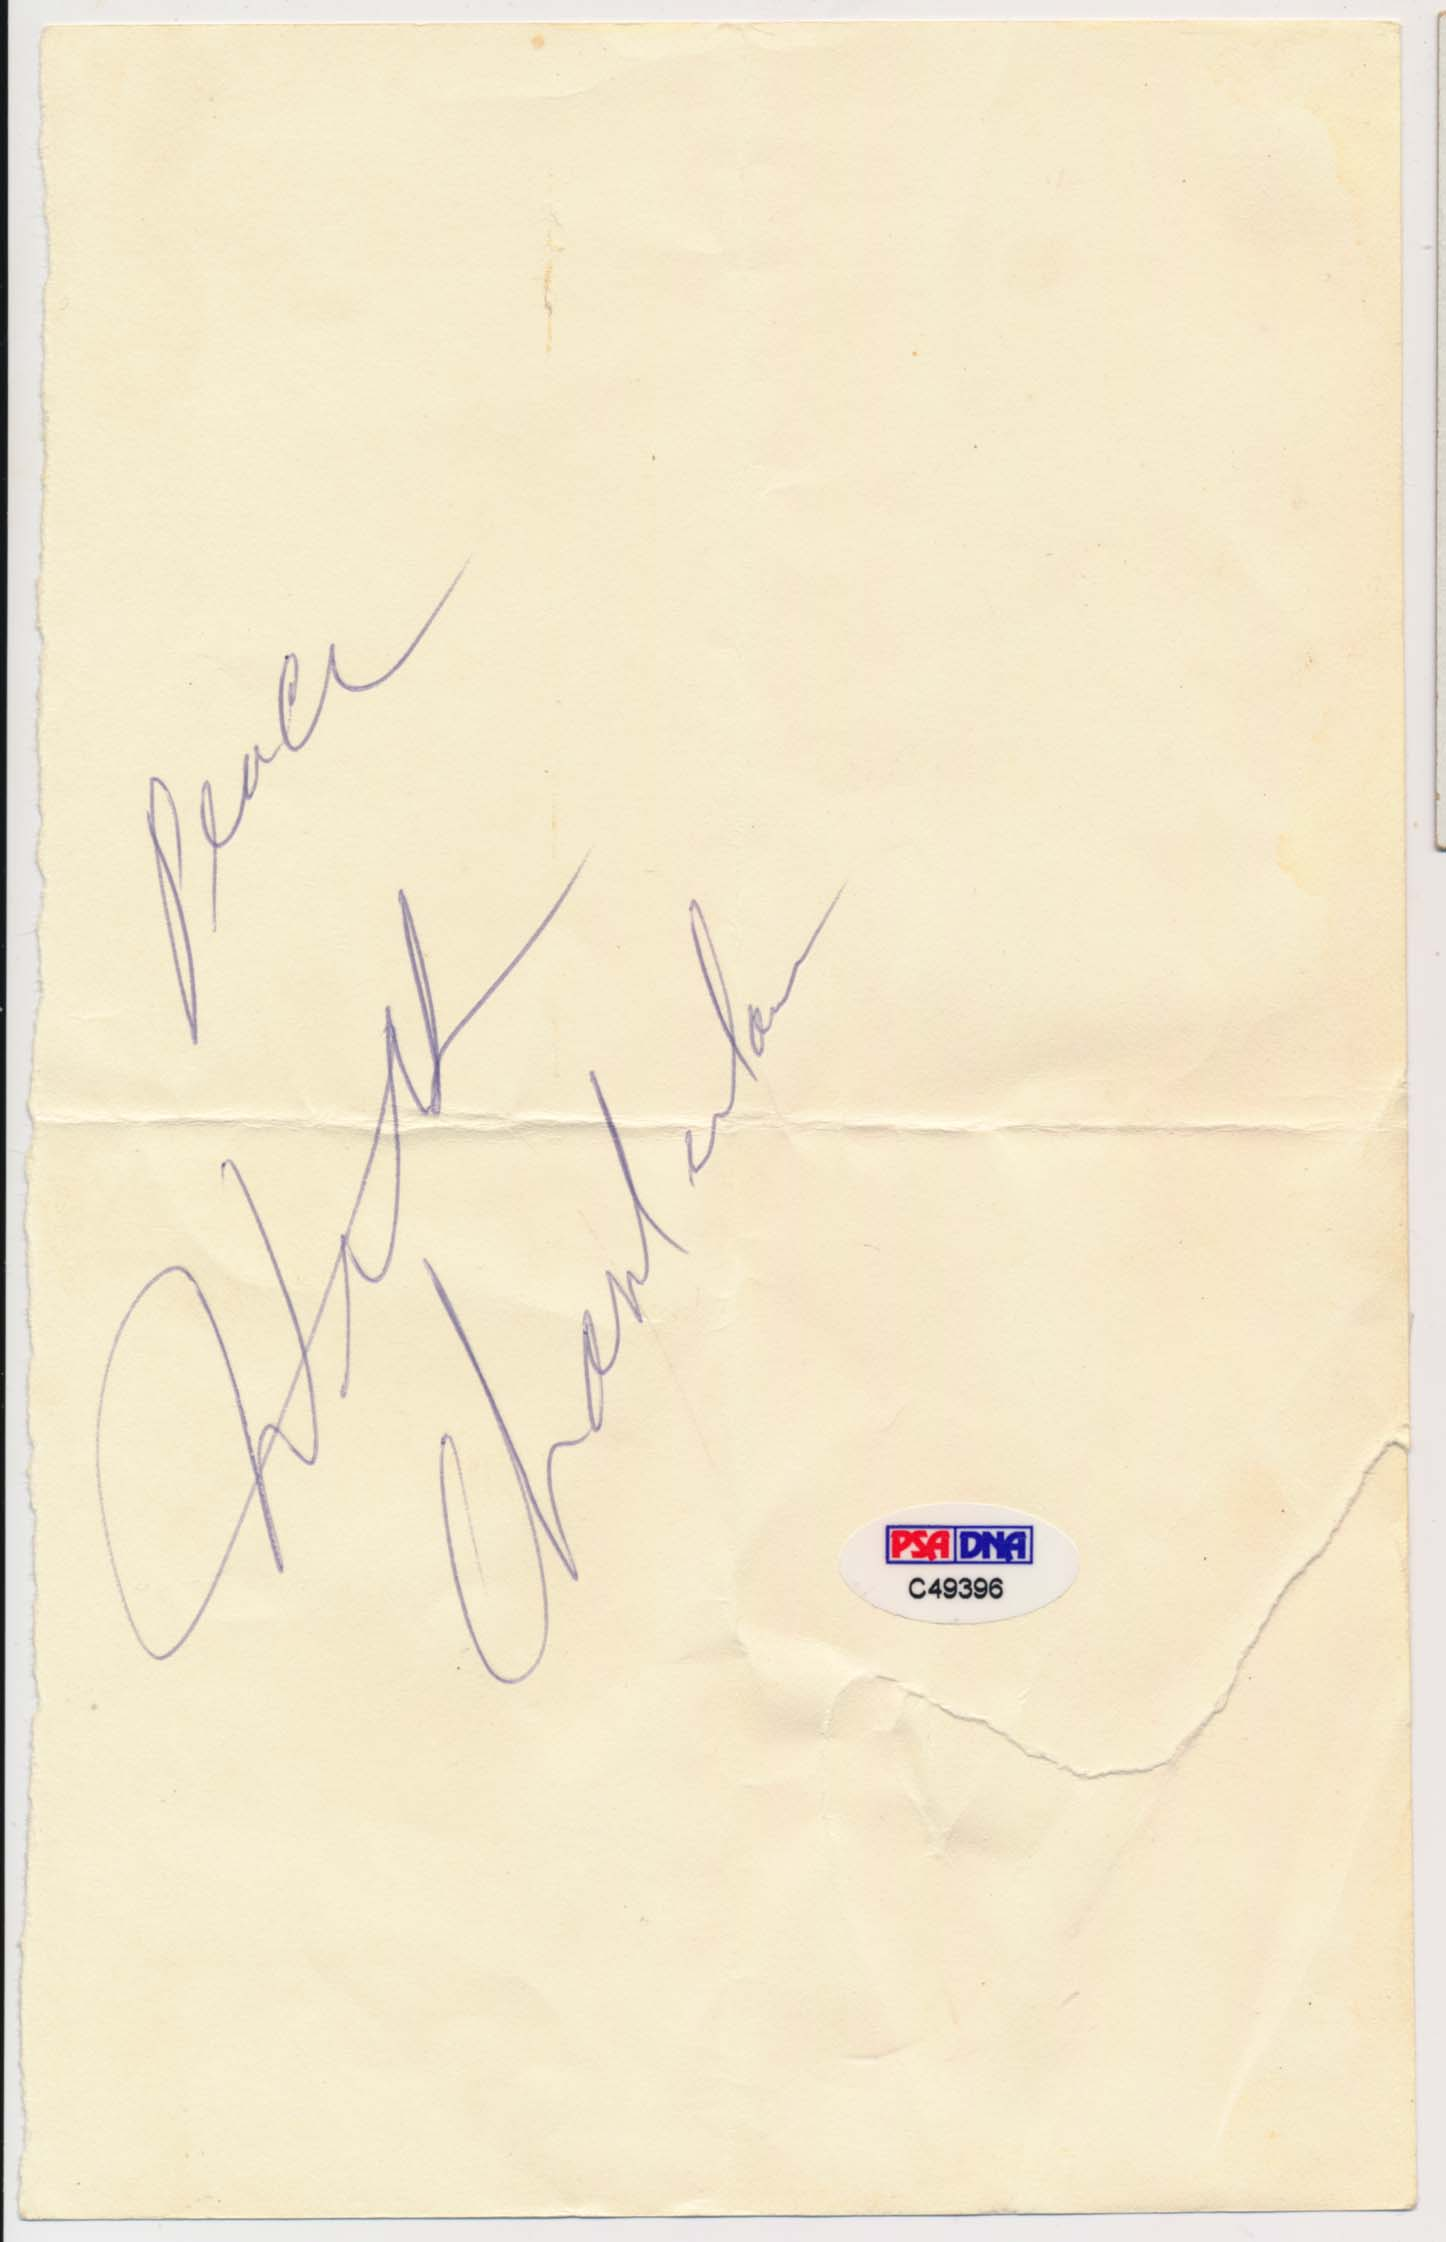 Lot #912    Chamberlain, Wilt Huge Signature Cond: 9